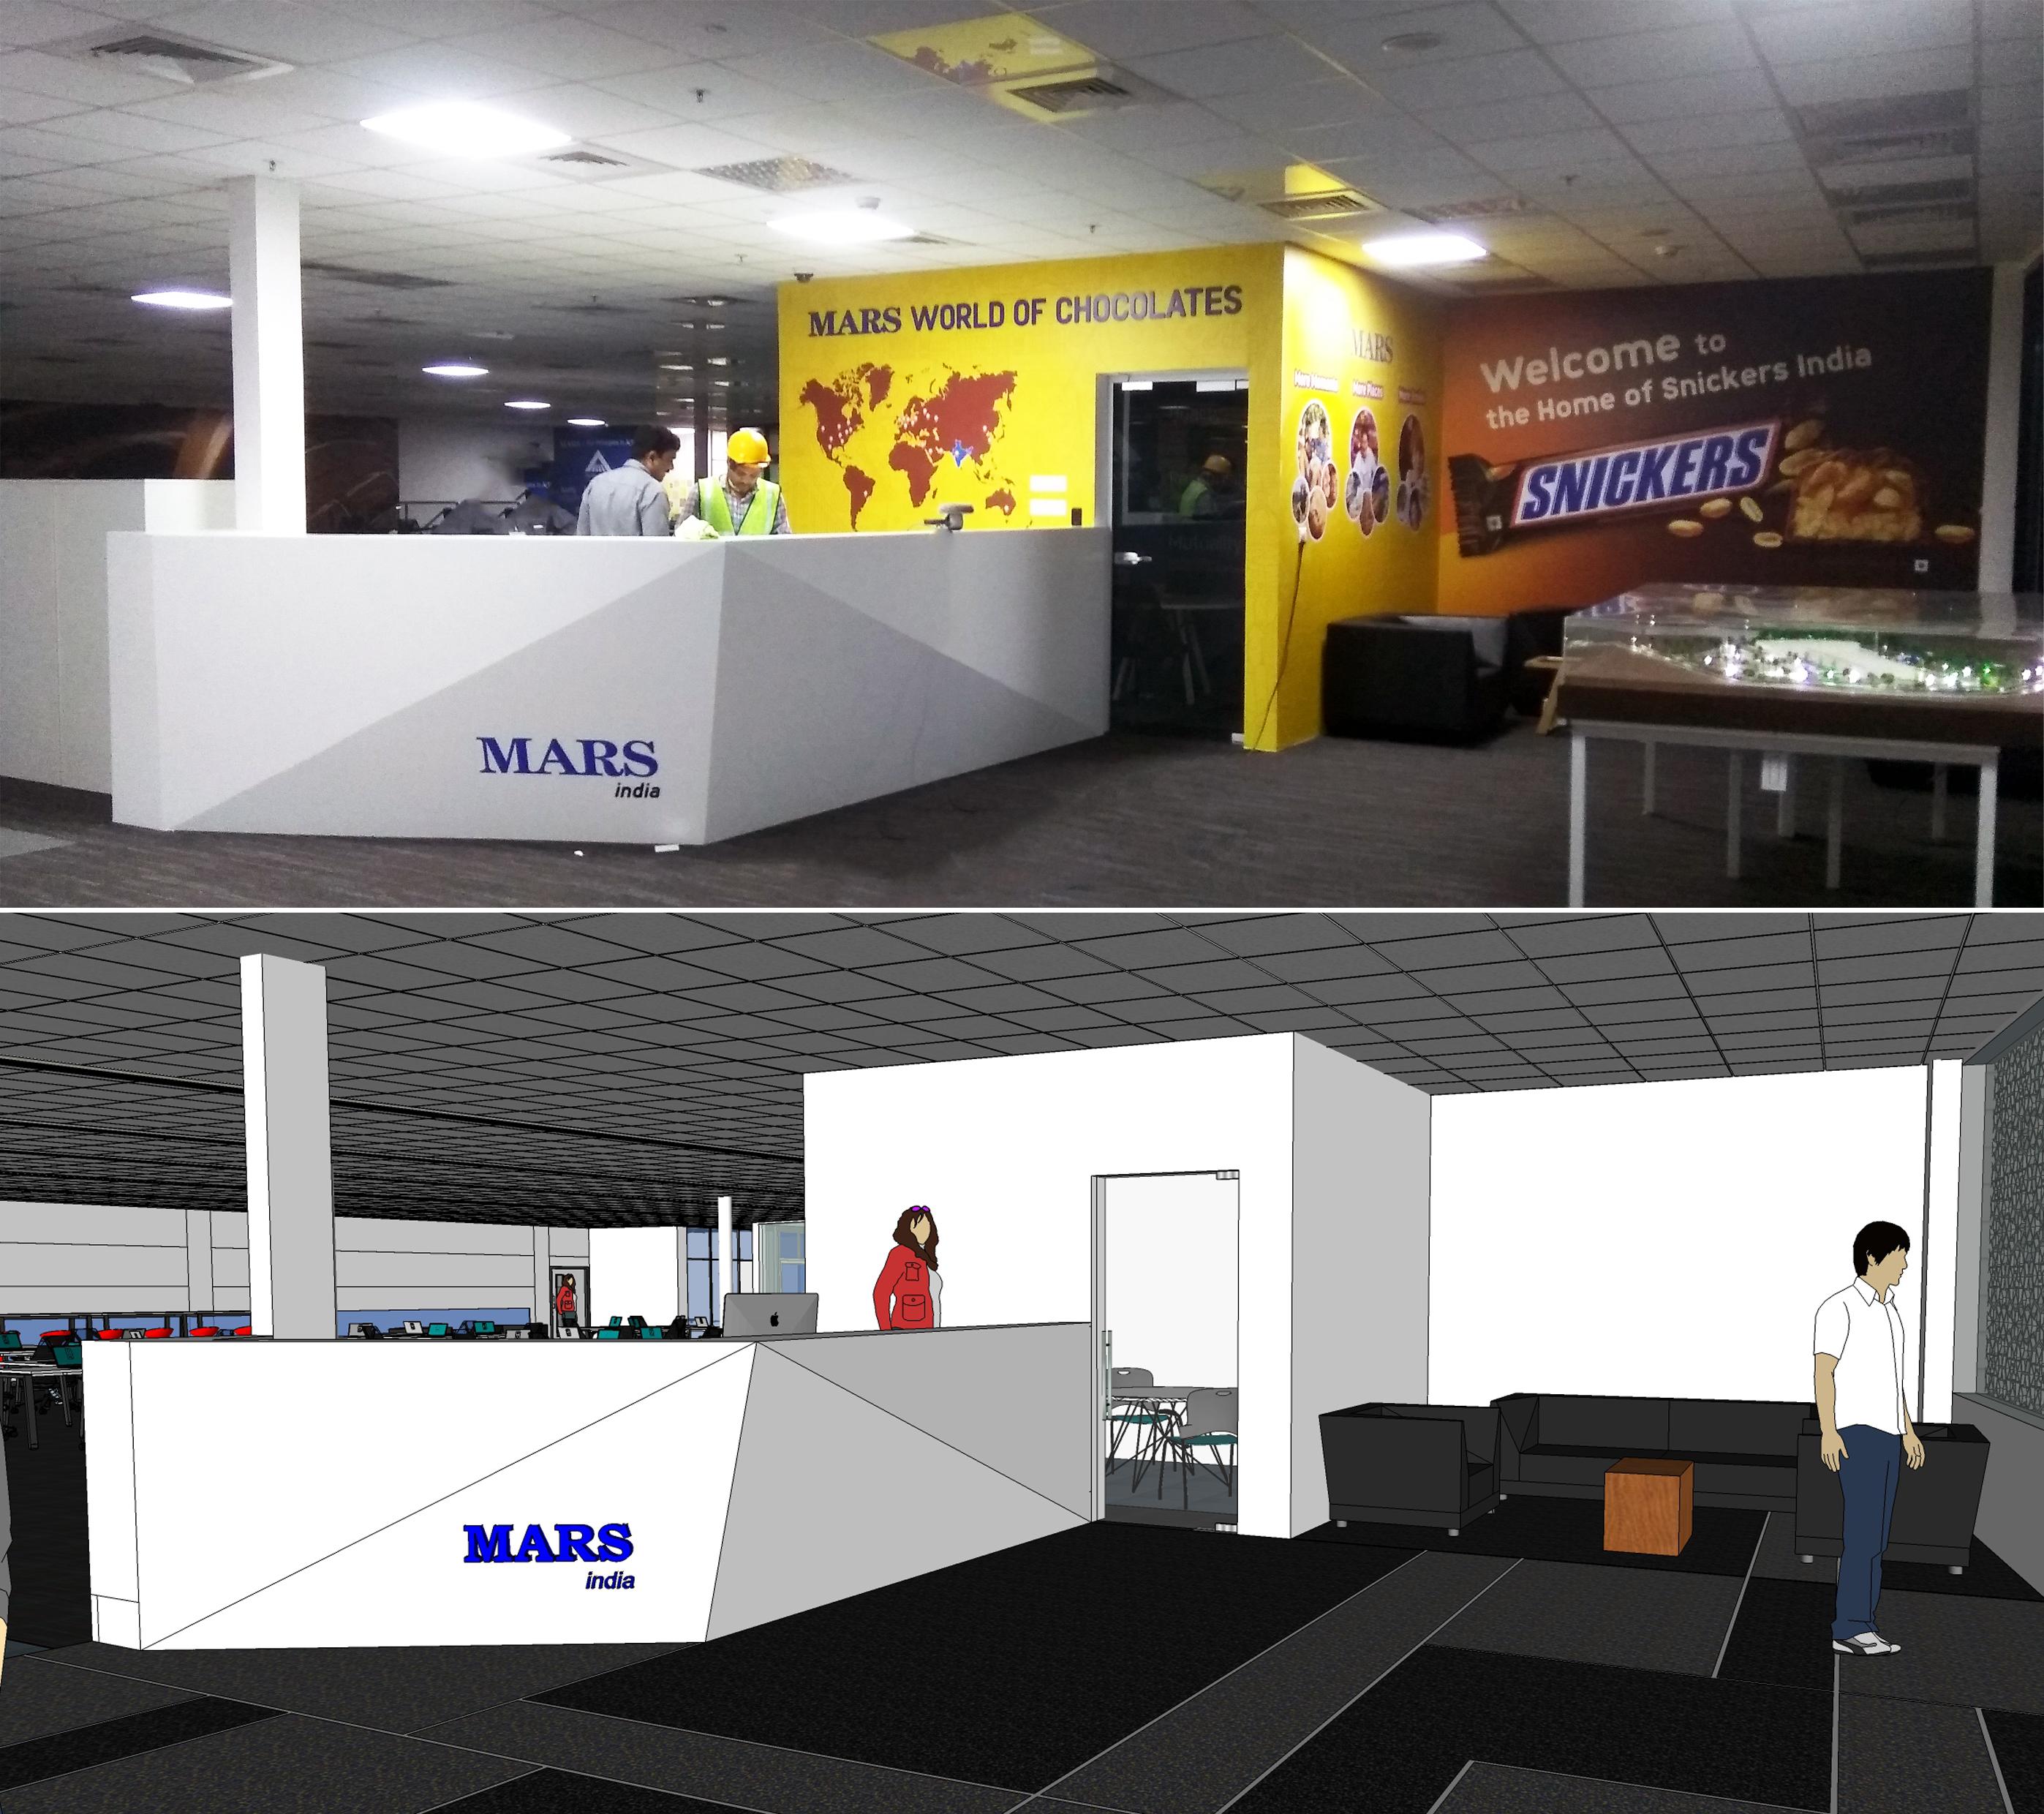 Mars India reception desk